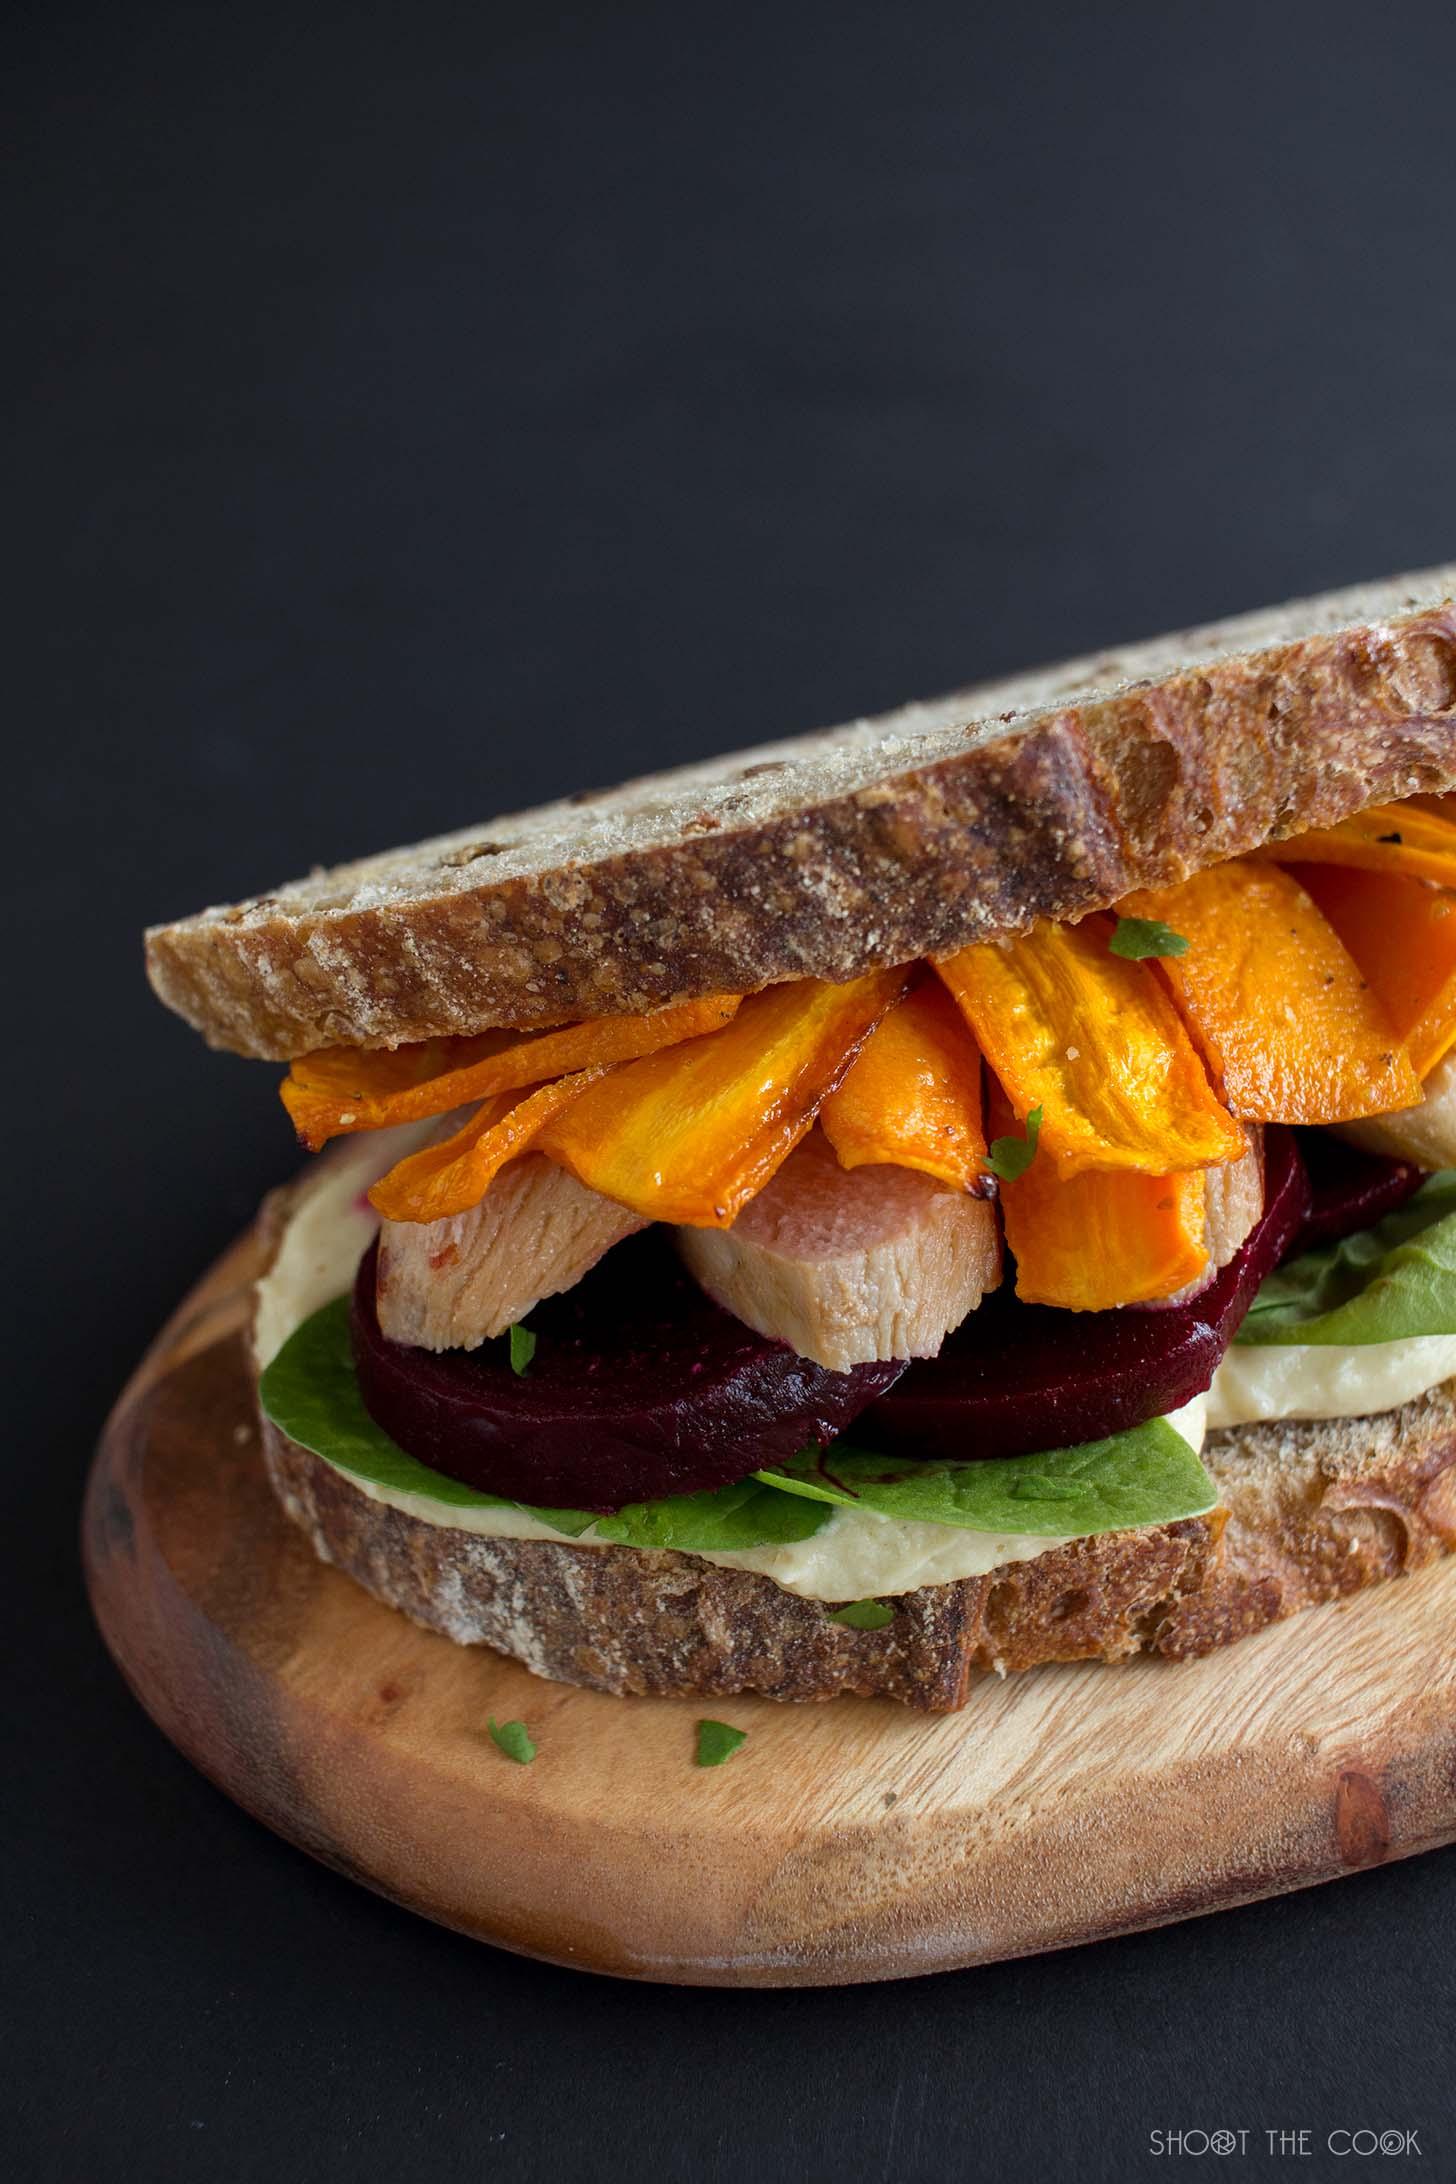 Sandwich de pollo extra jugoso